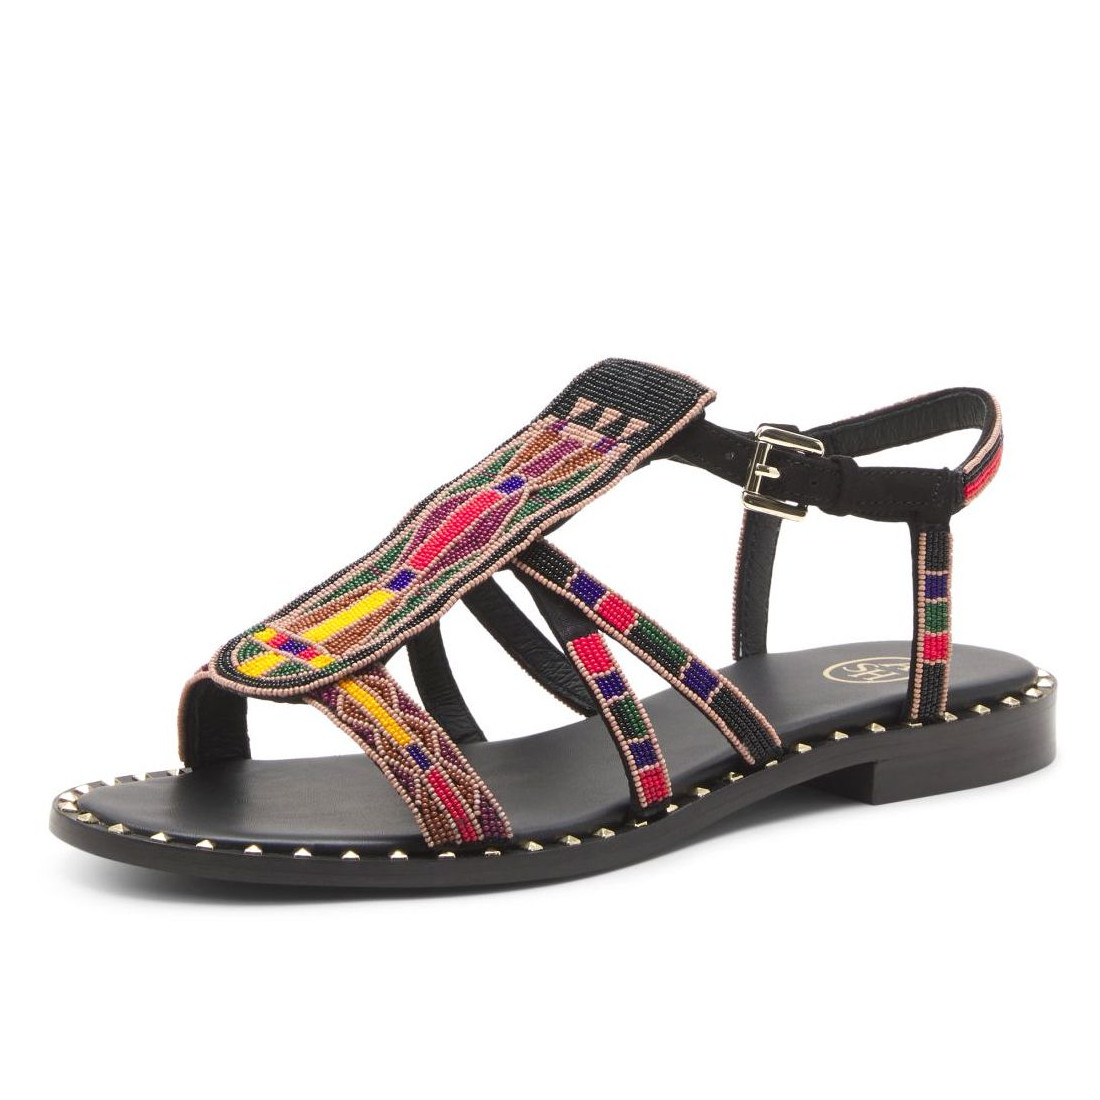 sandals woman ash peaceful04 8659